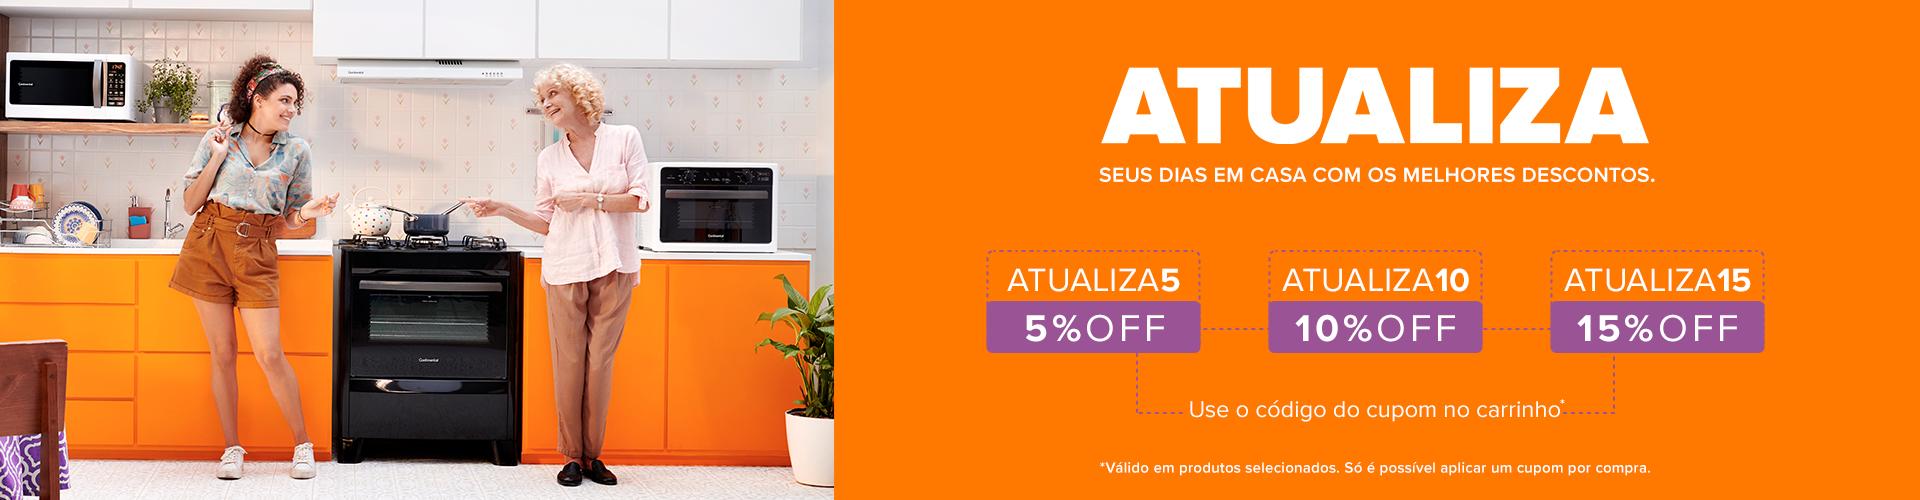 Atualiza - Comercial